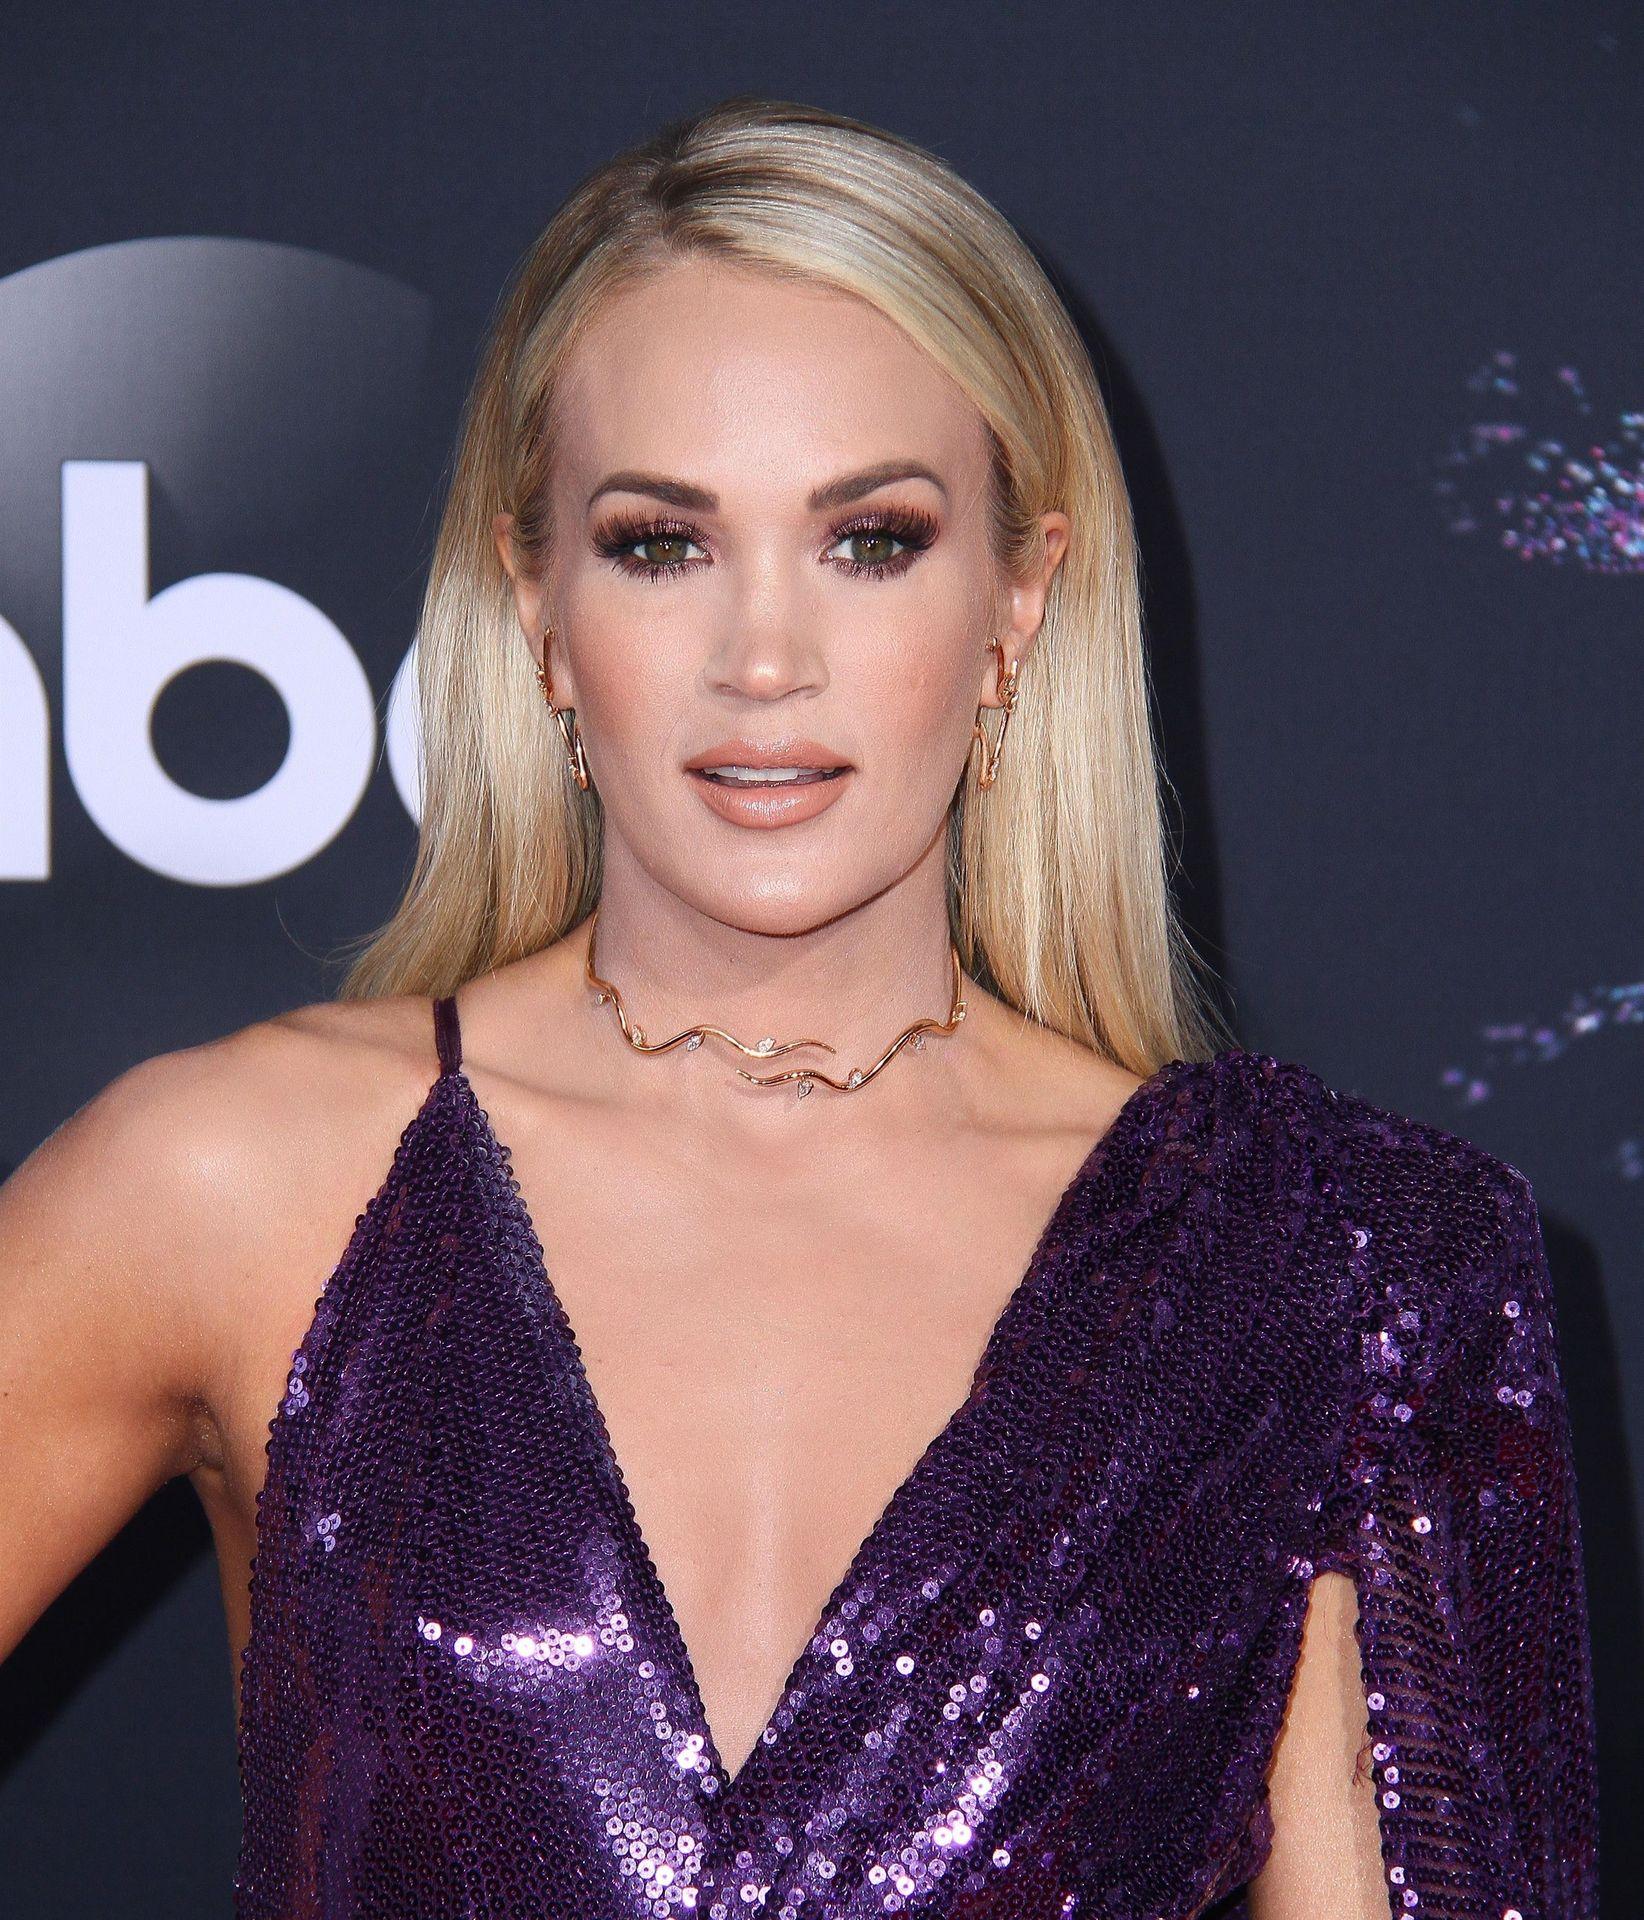 Carrie Underwood Sexy 0050